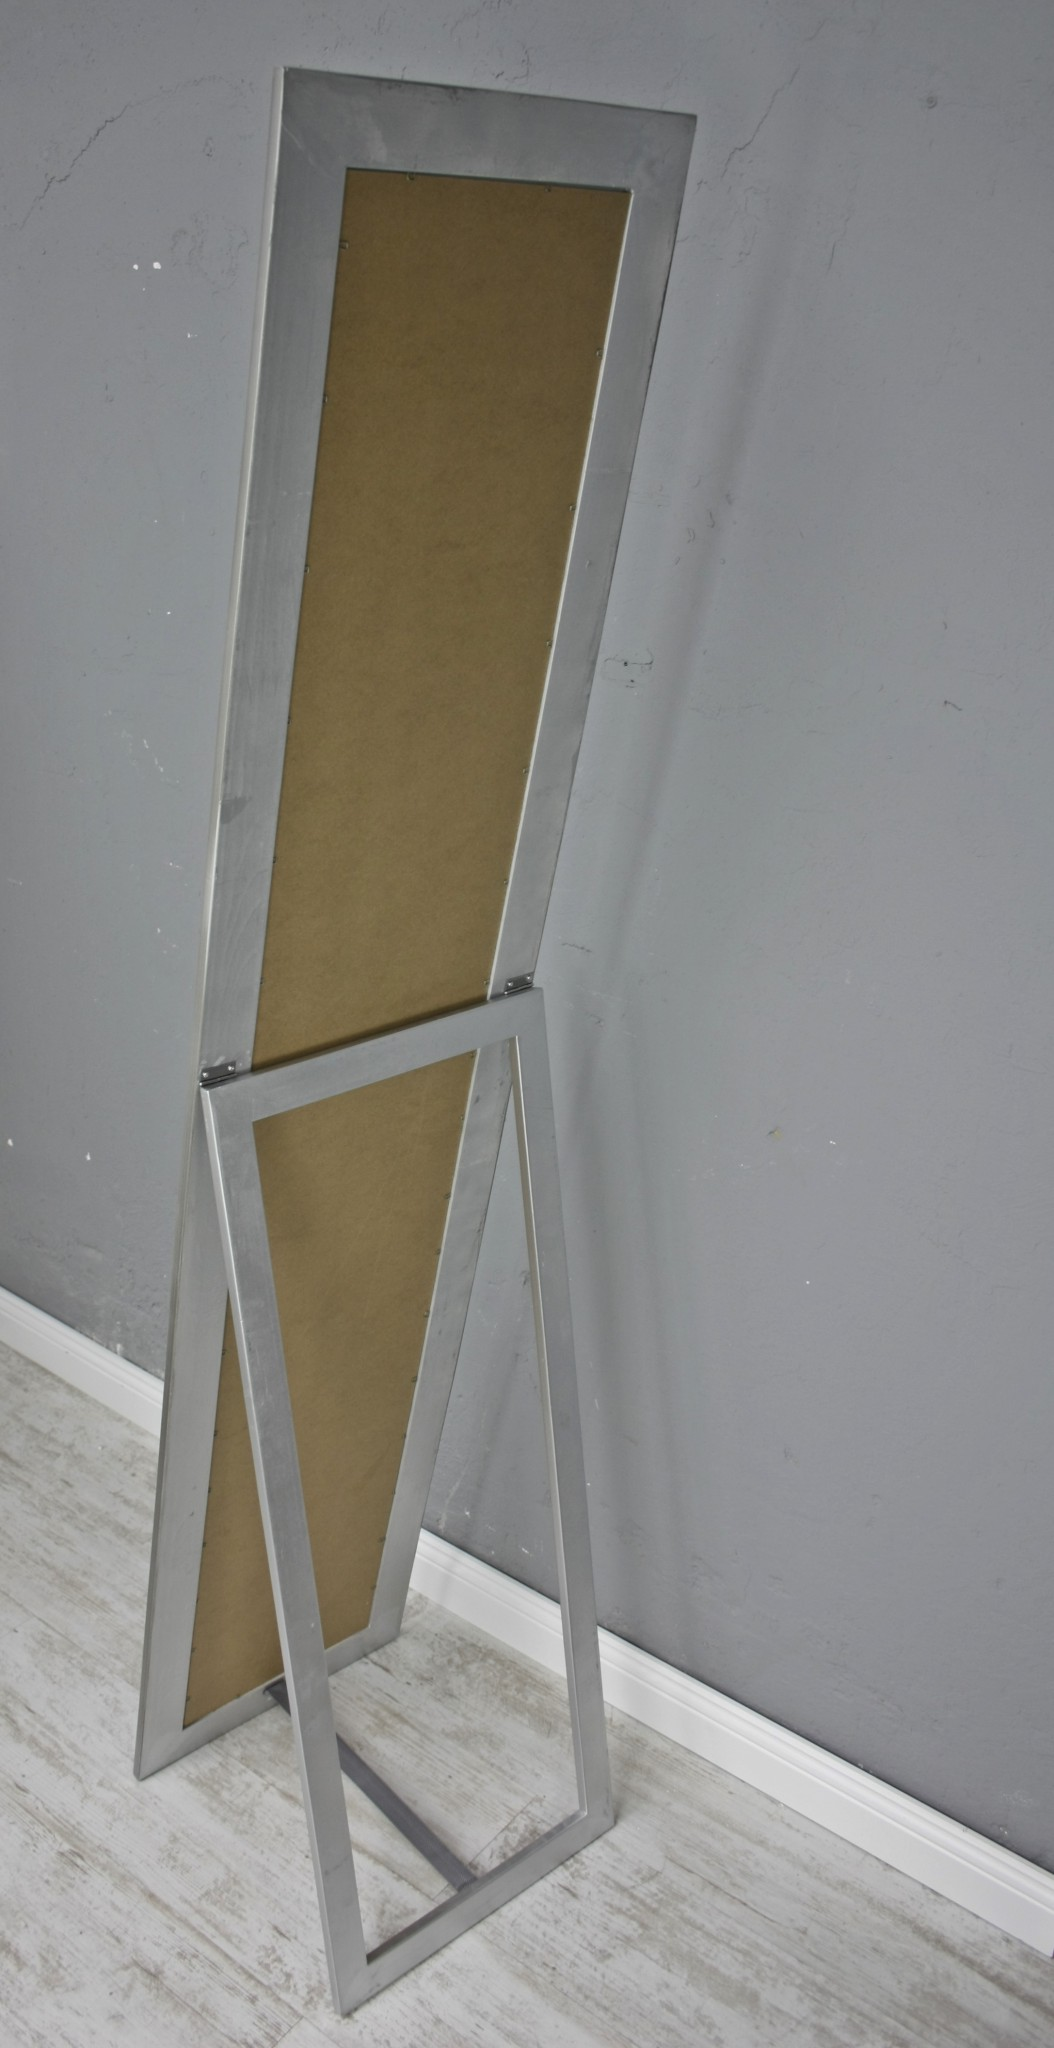 spiegel 180 wandspiegel standspiegel silber holz landhaus. Black Bedroom Furniture Sets. Home Design Ideas